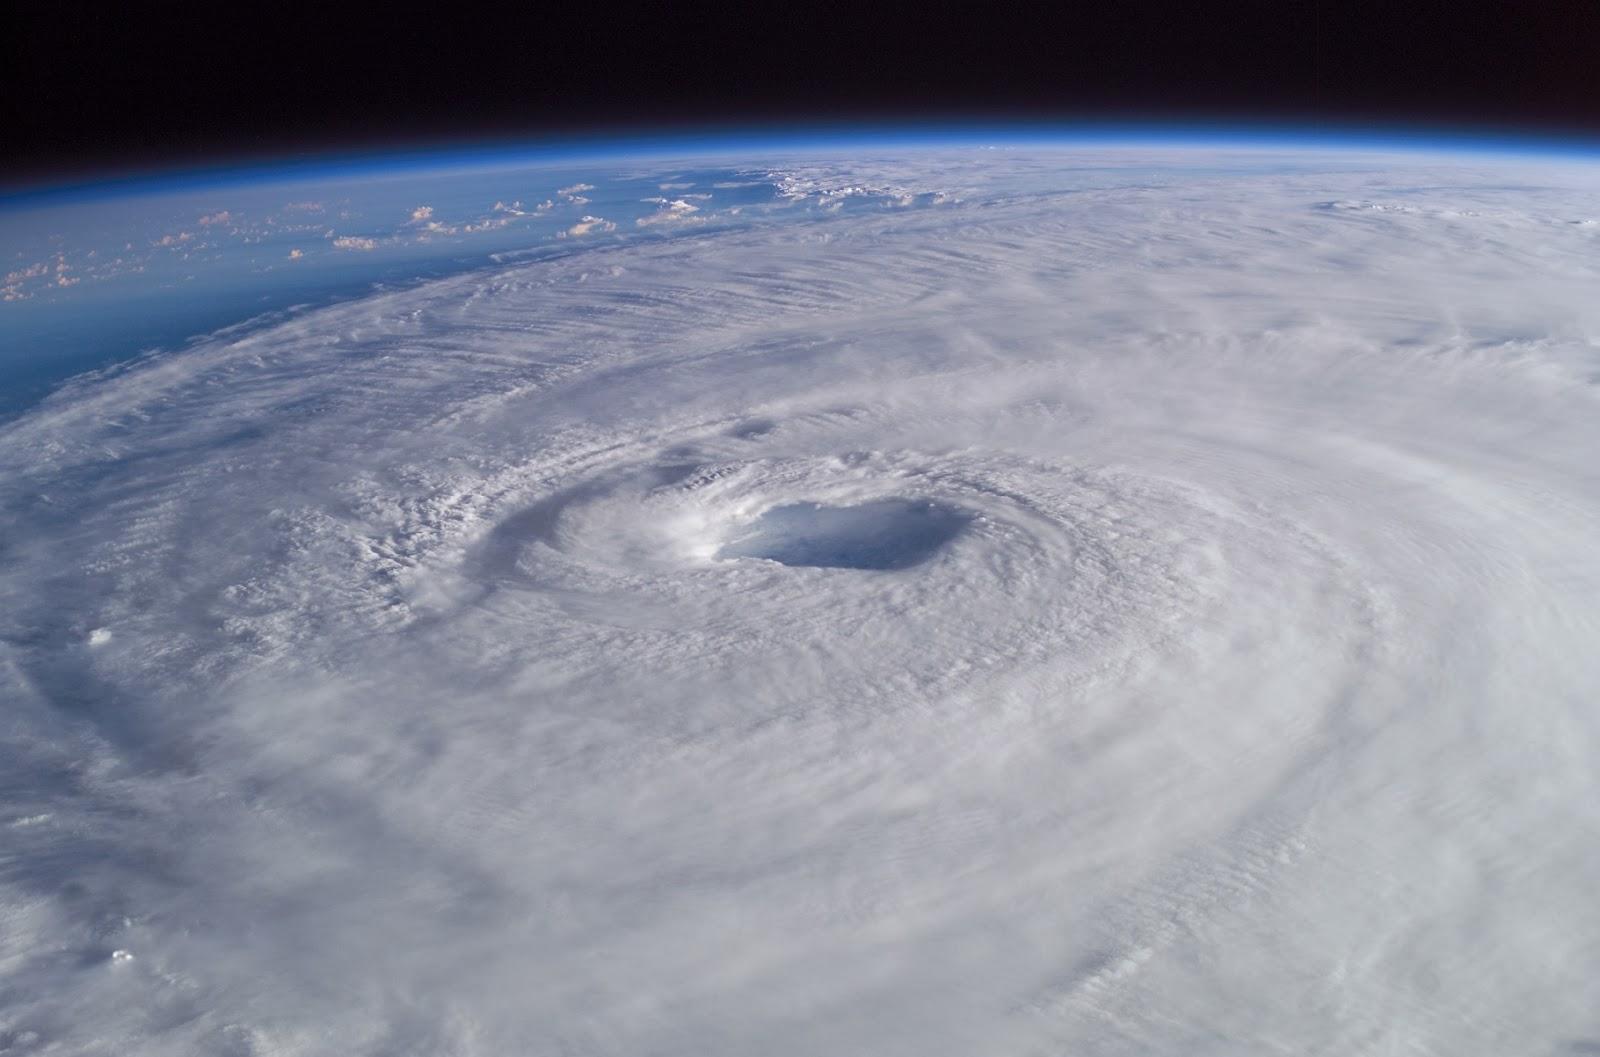 Cyclone réunion